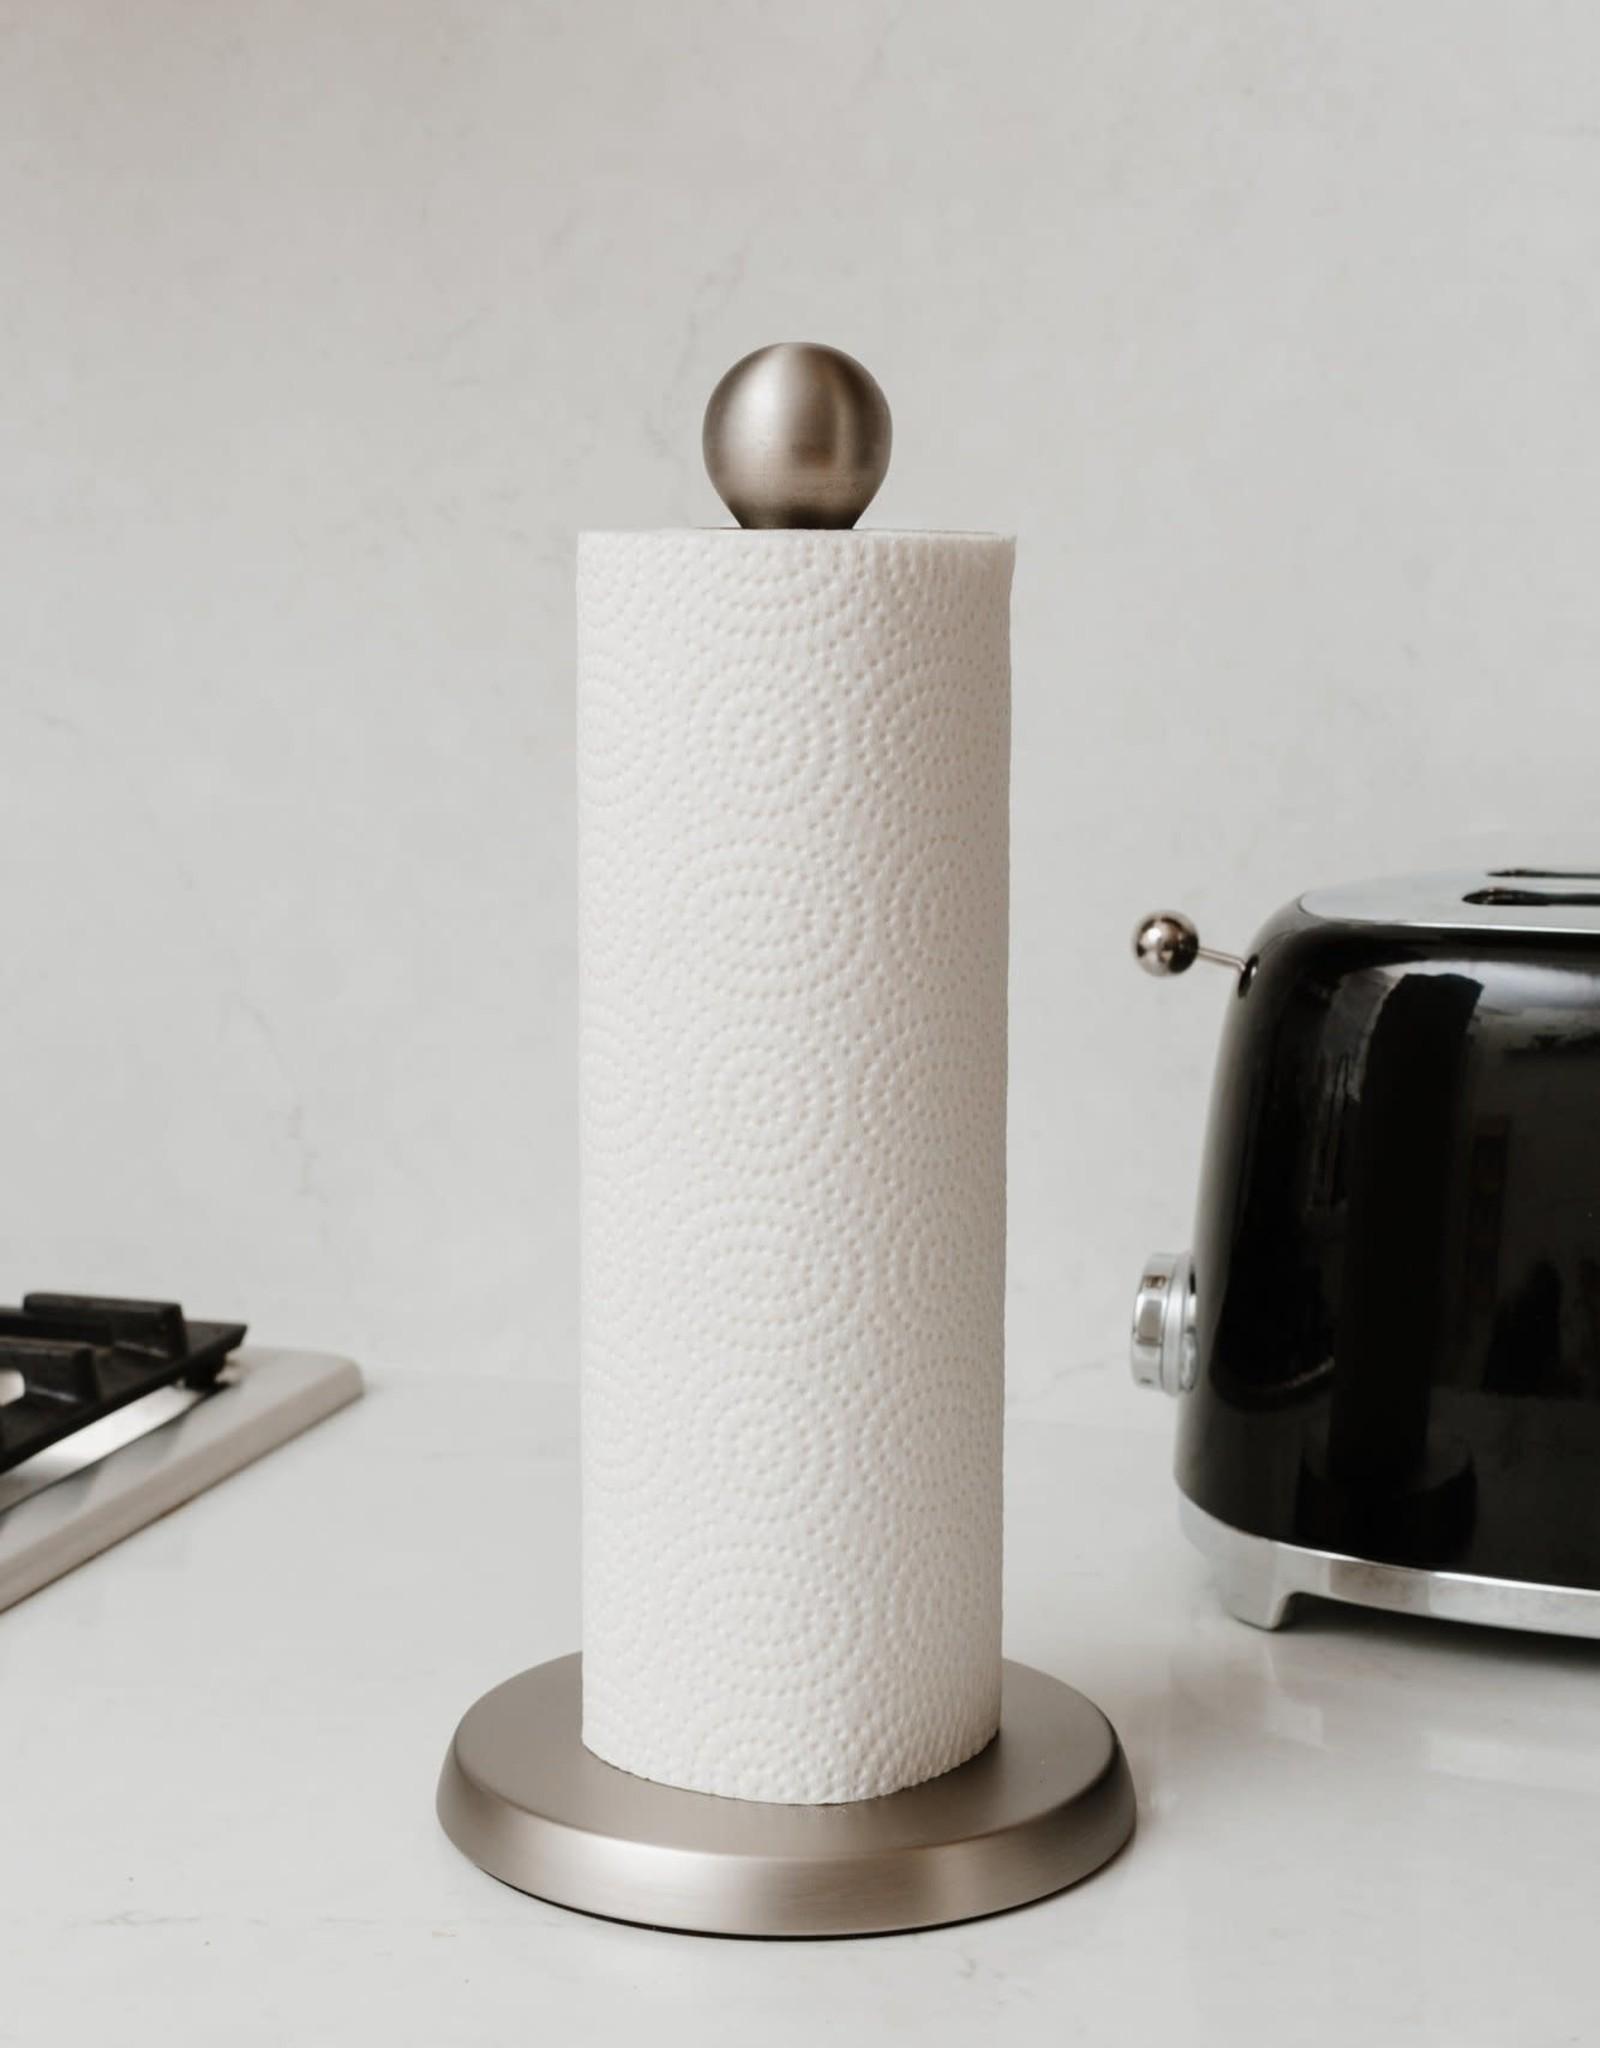 UMBRA UMBRA TEARDROP SATIN NICKEL PAPER TOWEL HOLDER